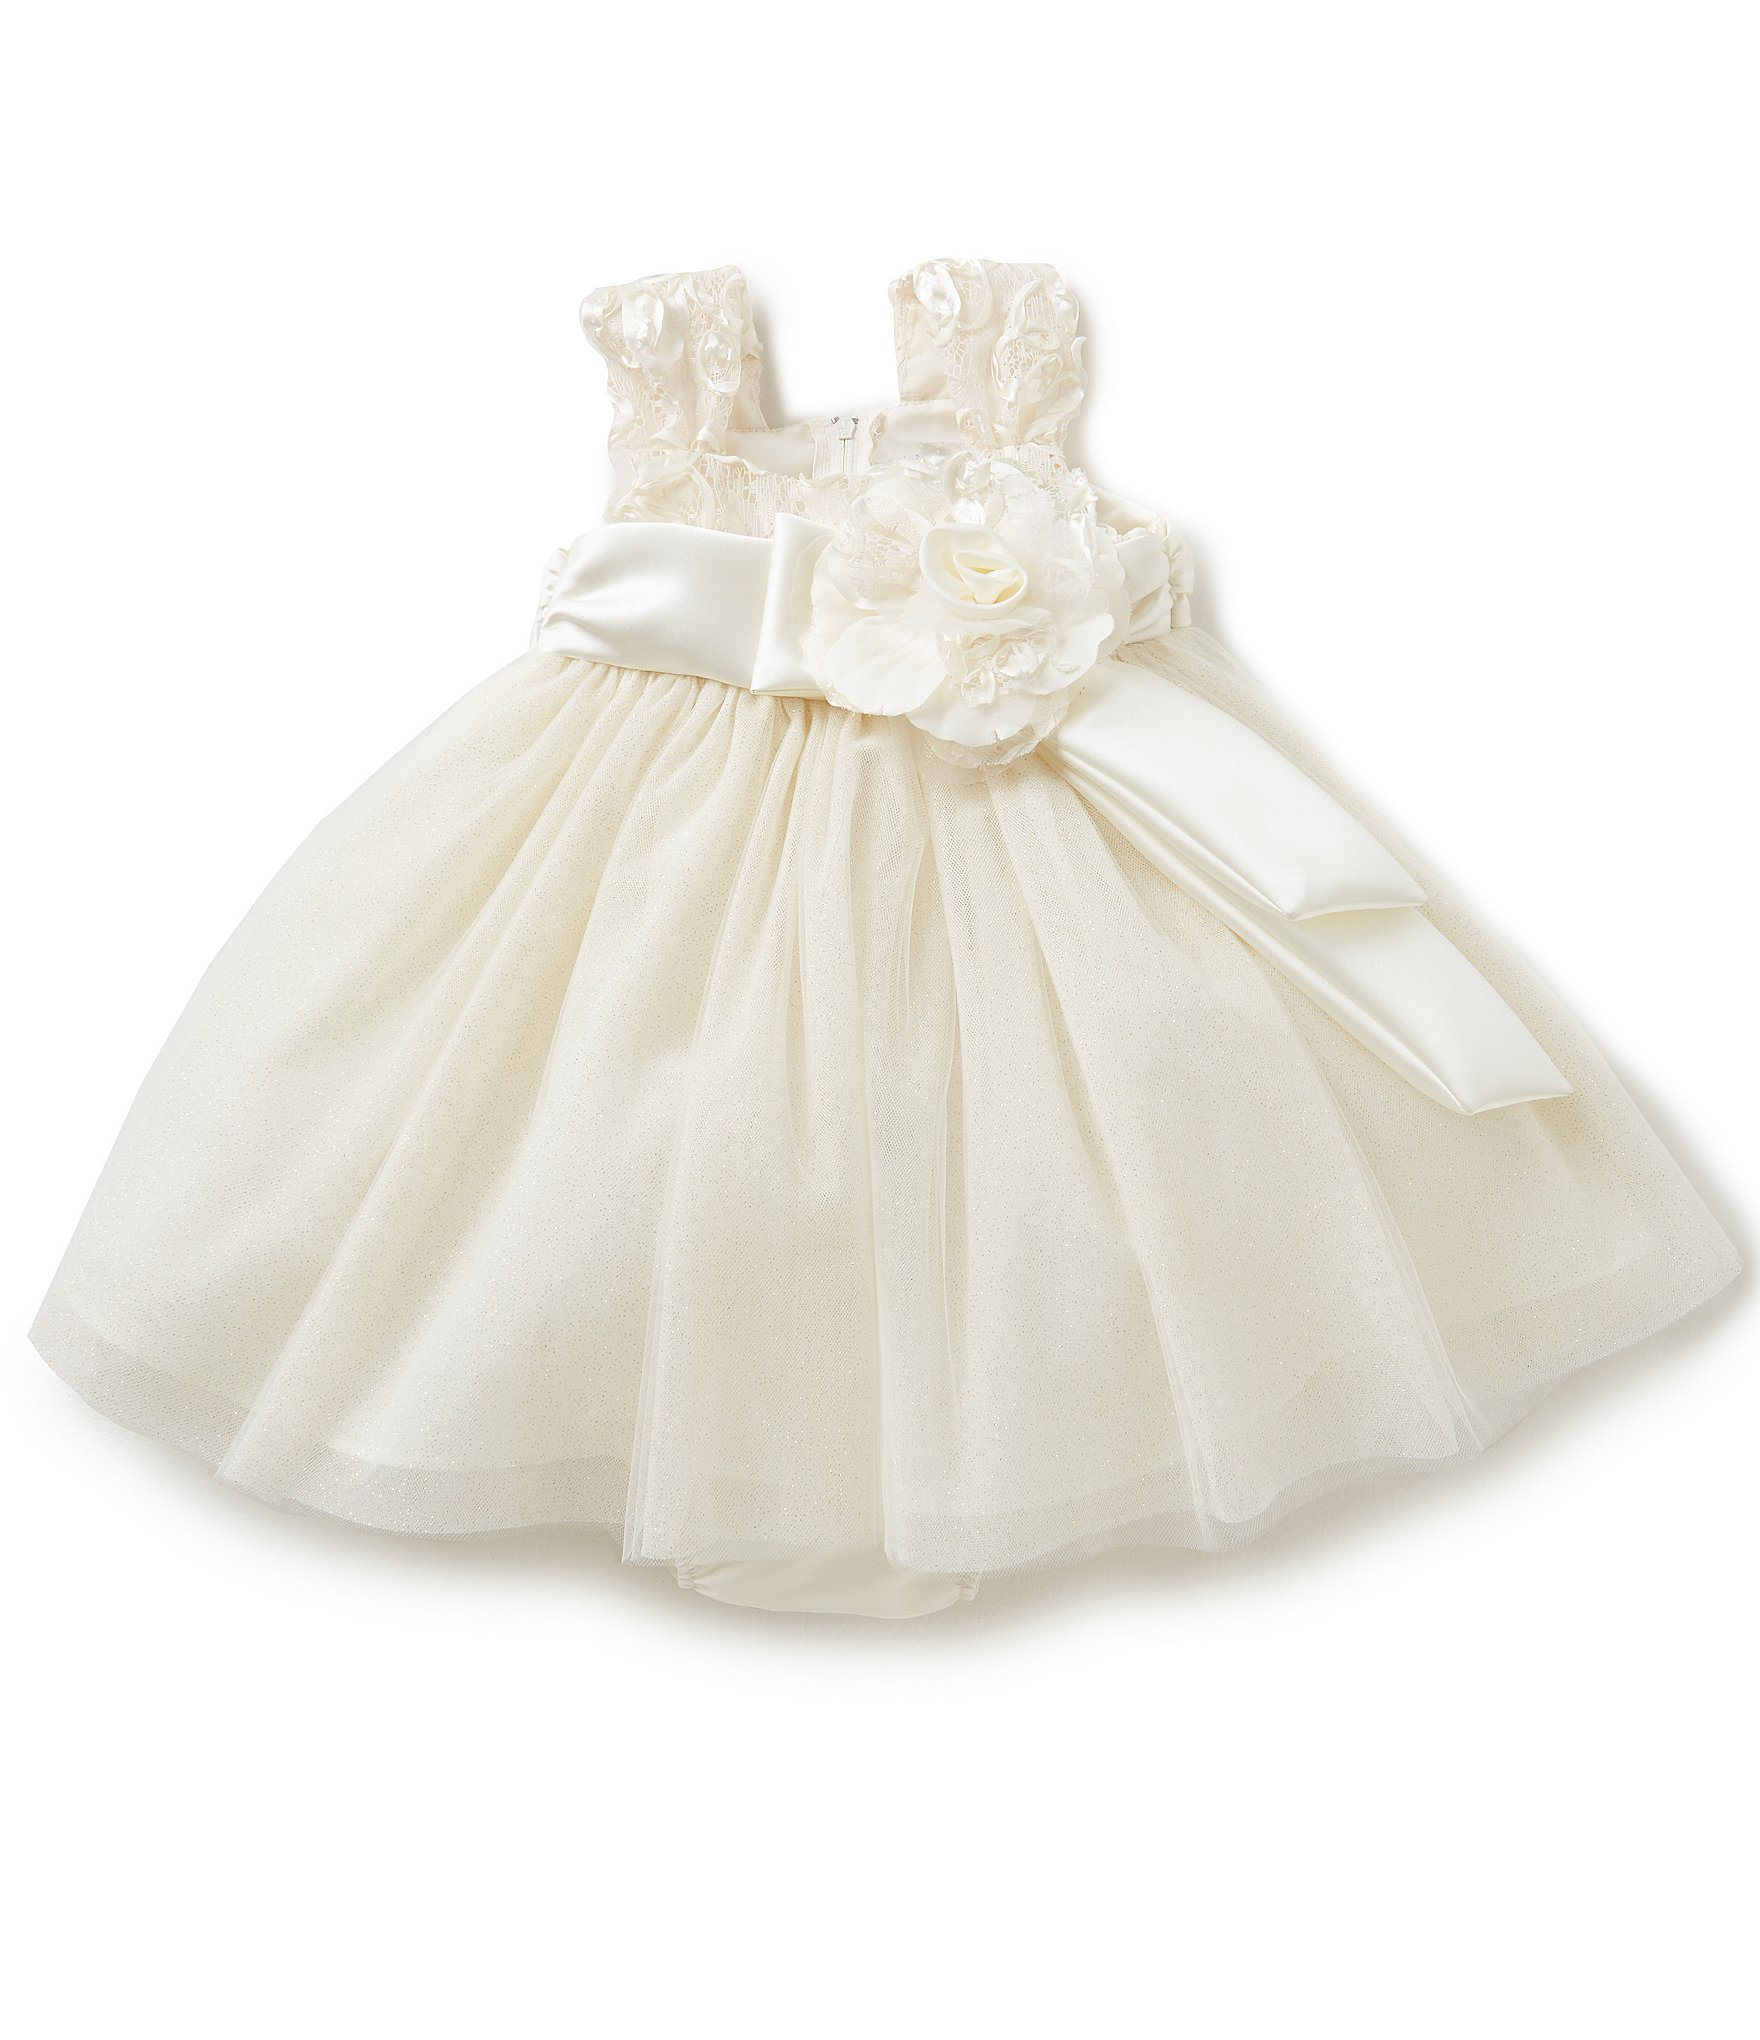 Kids baby baby girls apparel dresses dillards ombrellifo Choice Image